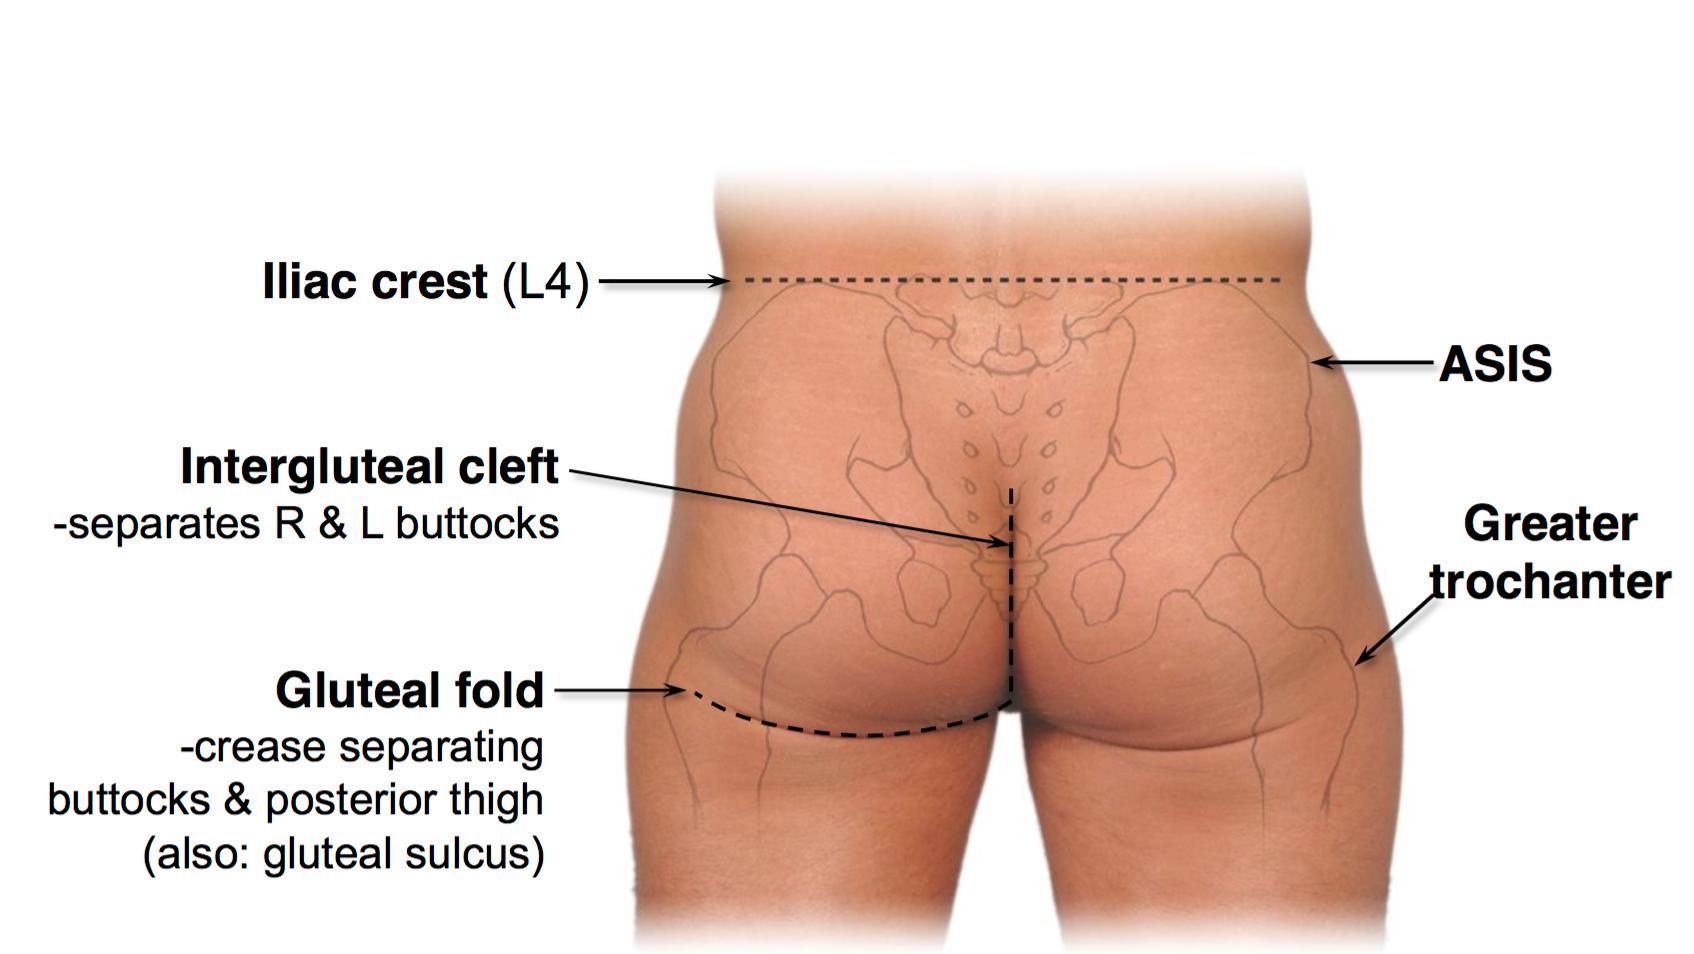 Luxury Buttock Anatomy Surface Gift - Human Anatomy Images ...